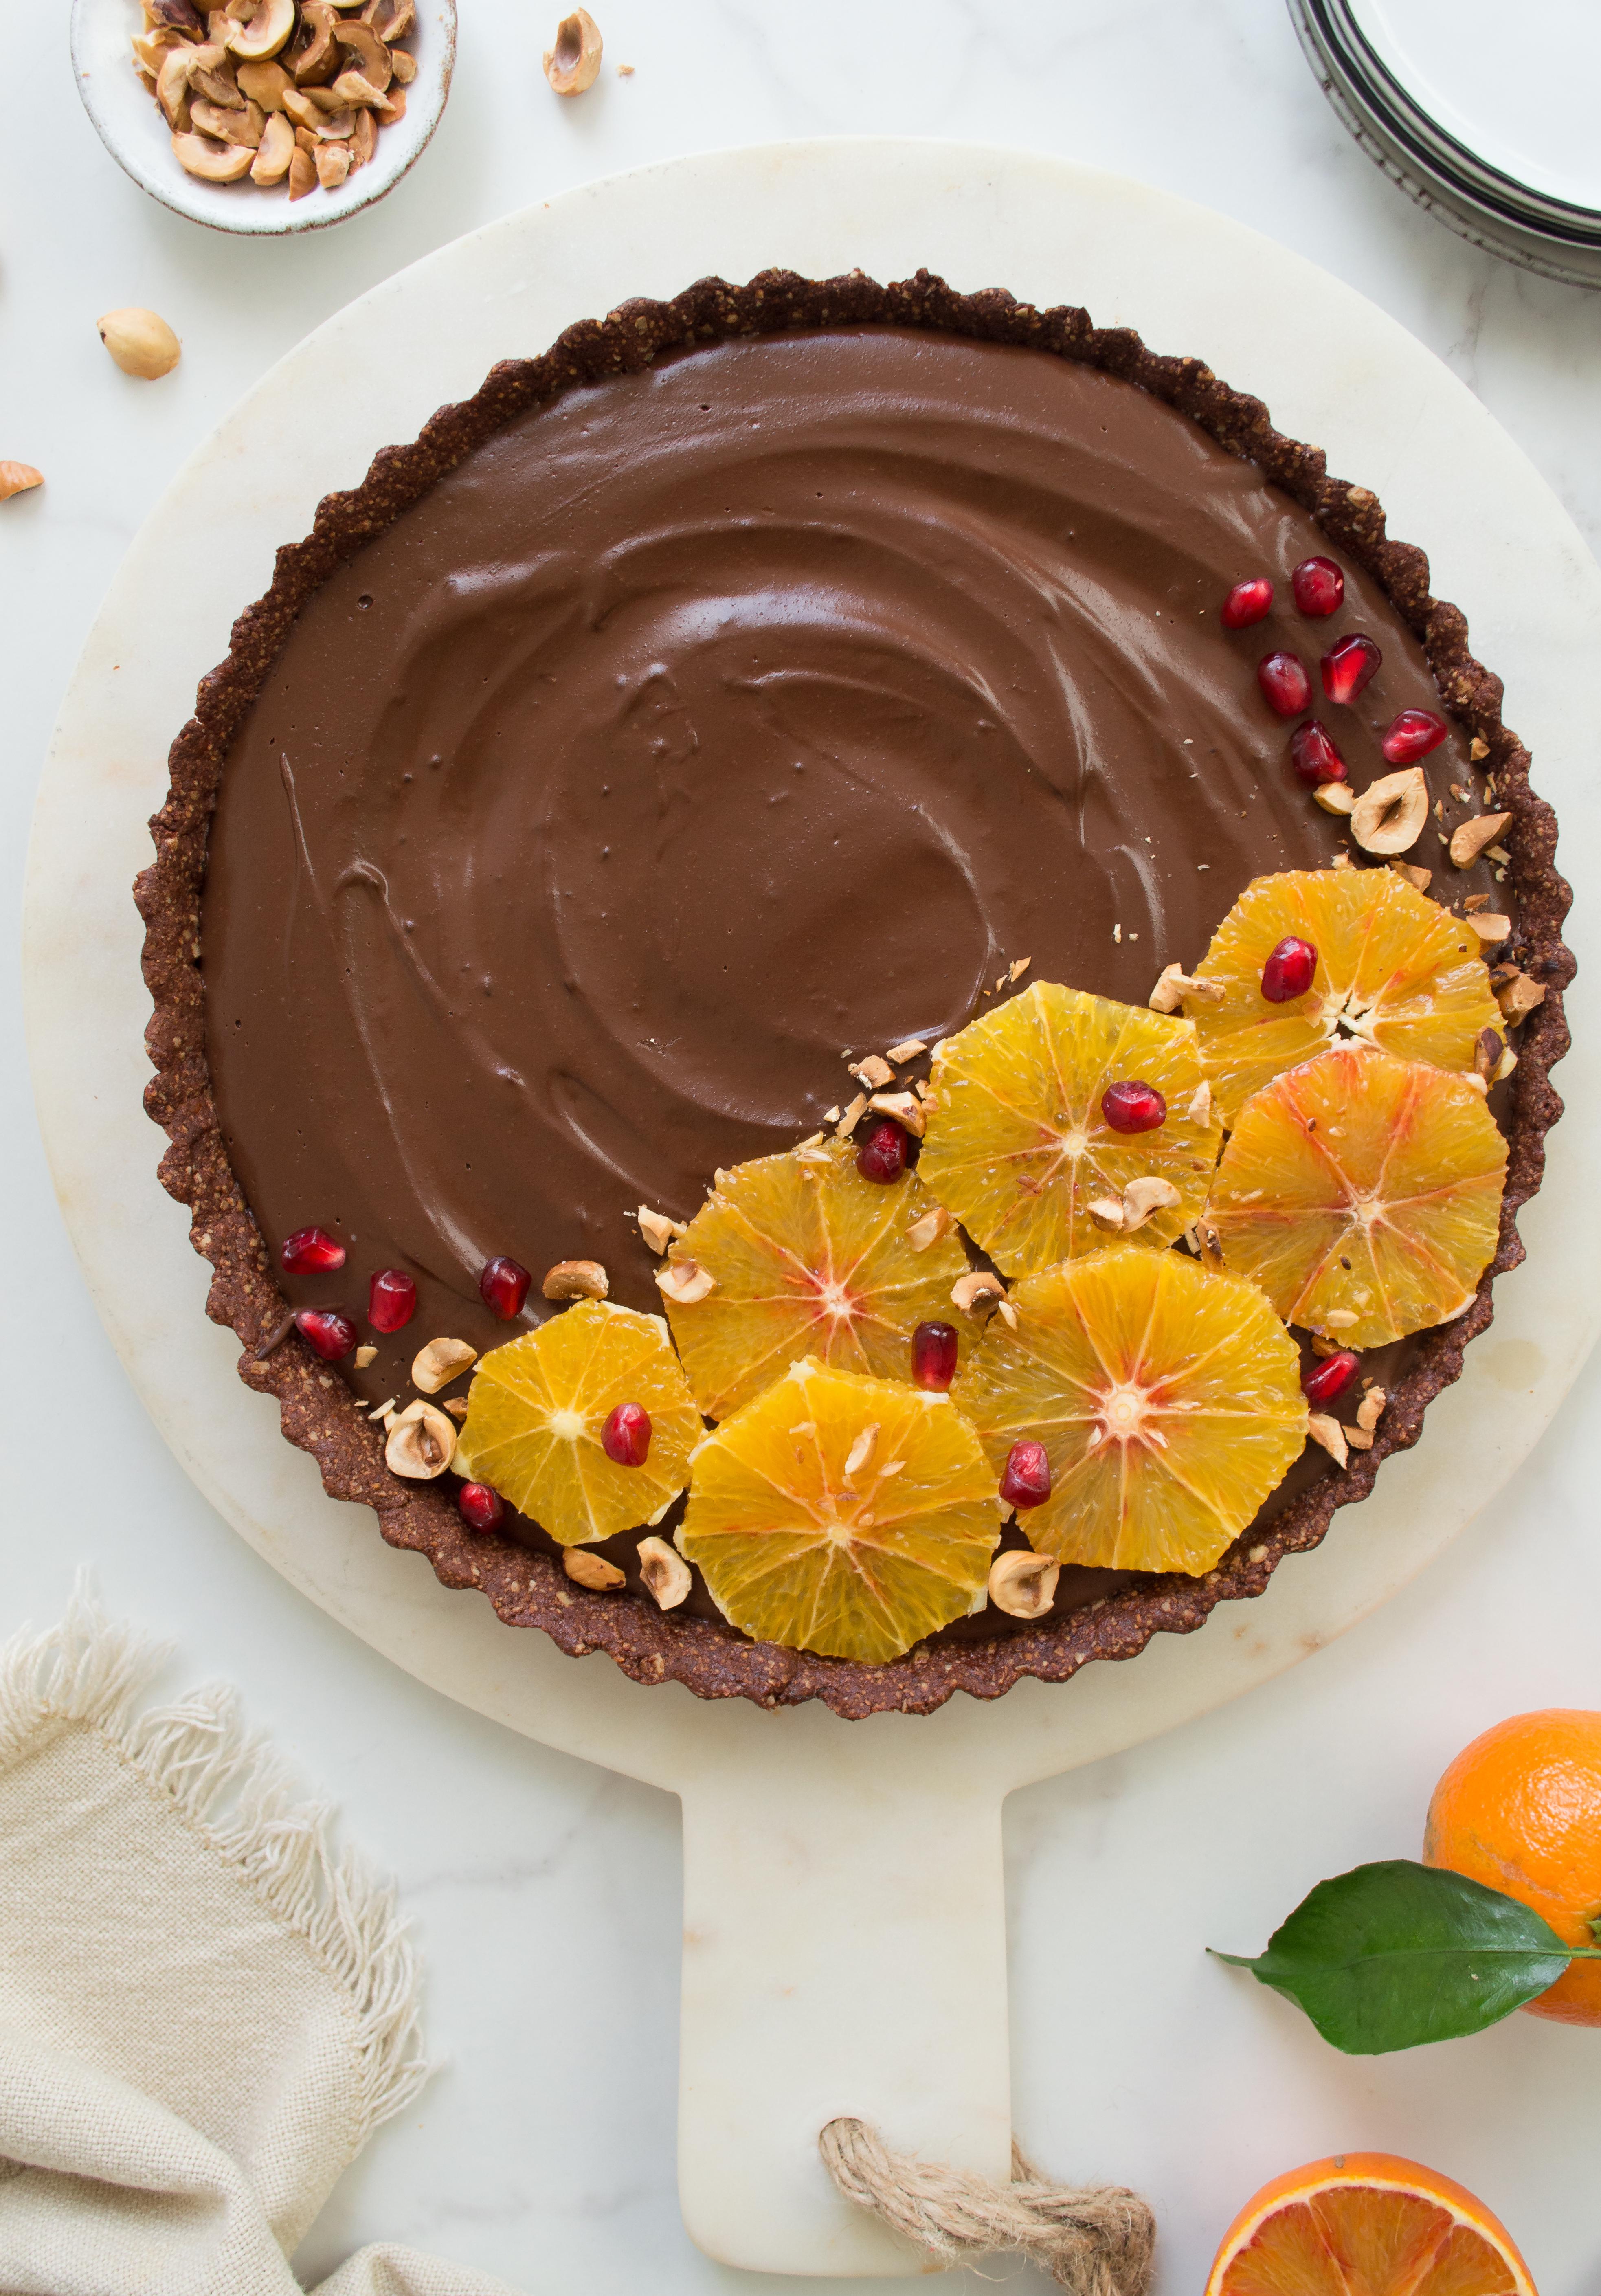 Vegan blood orange & chocolate tart - perfect dessert for Valentine's Day